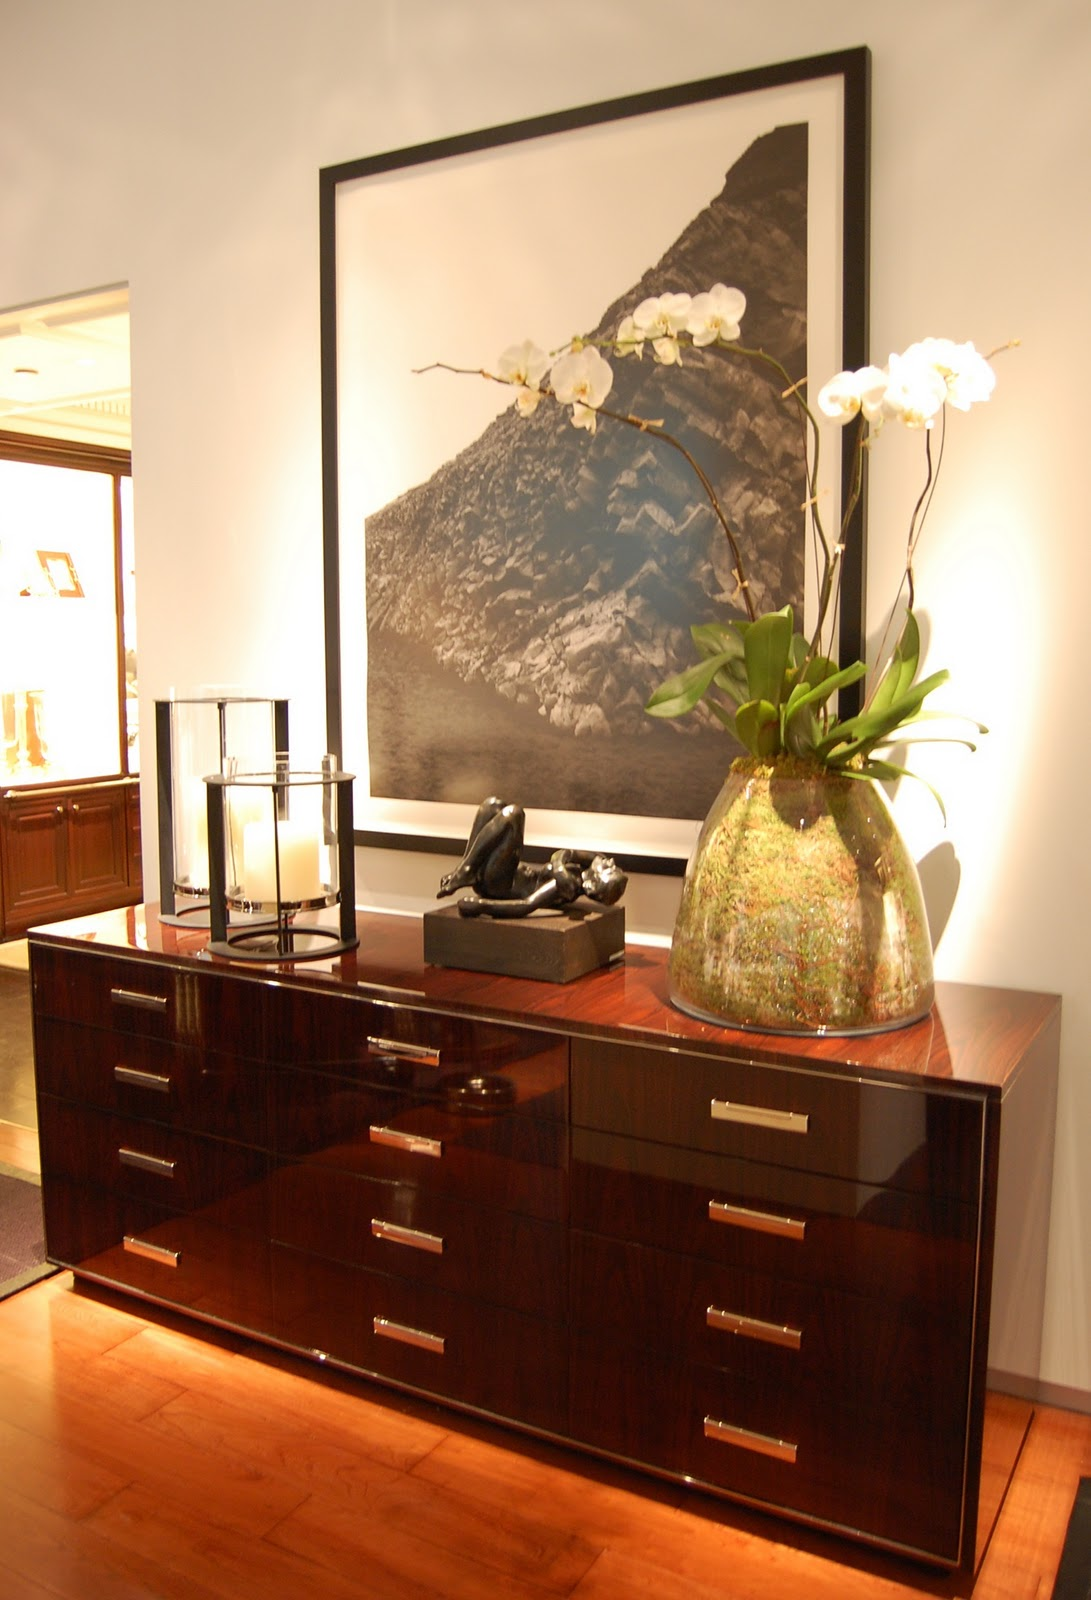 red pom pom the best choice ralph lauren home. Black Bedroom Furniture Sets. Home Design Ideas